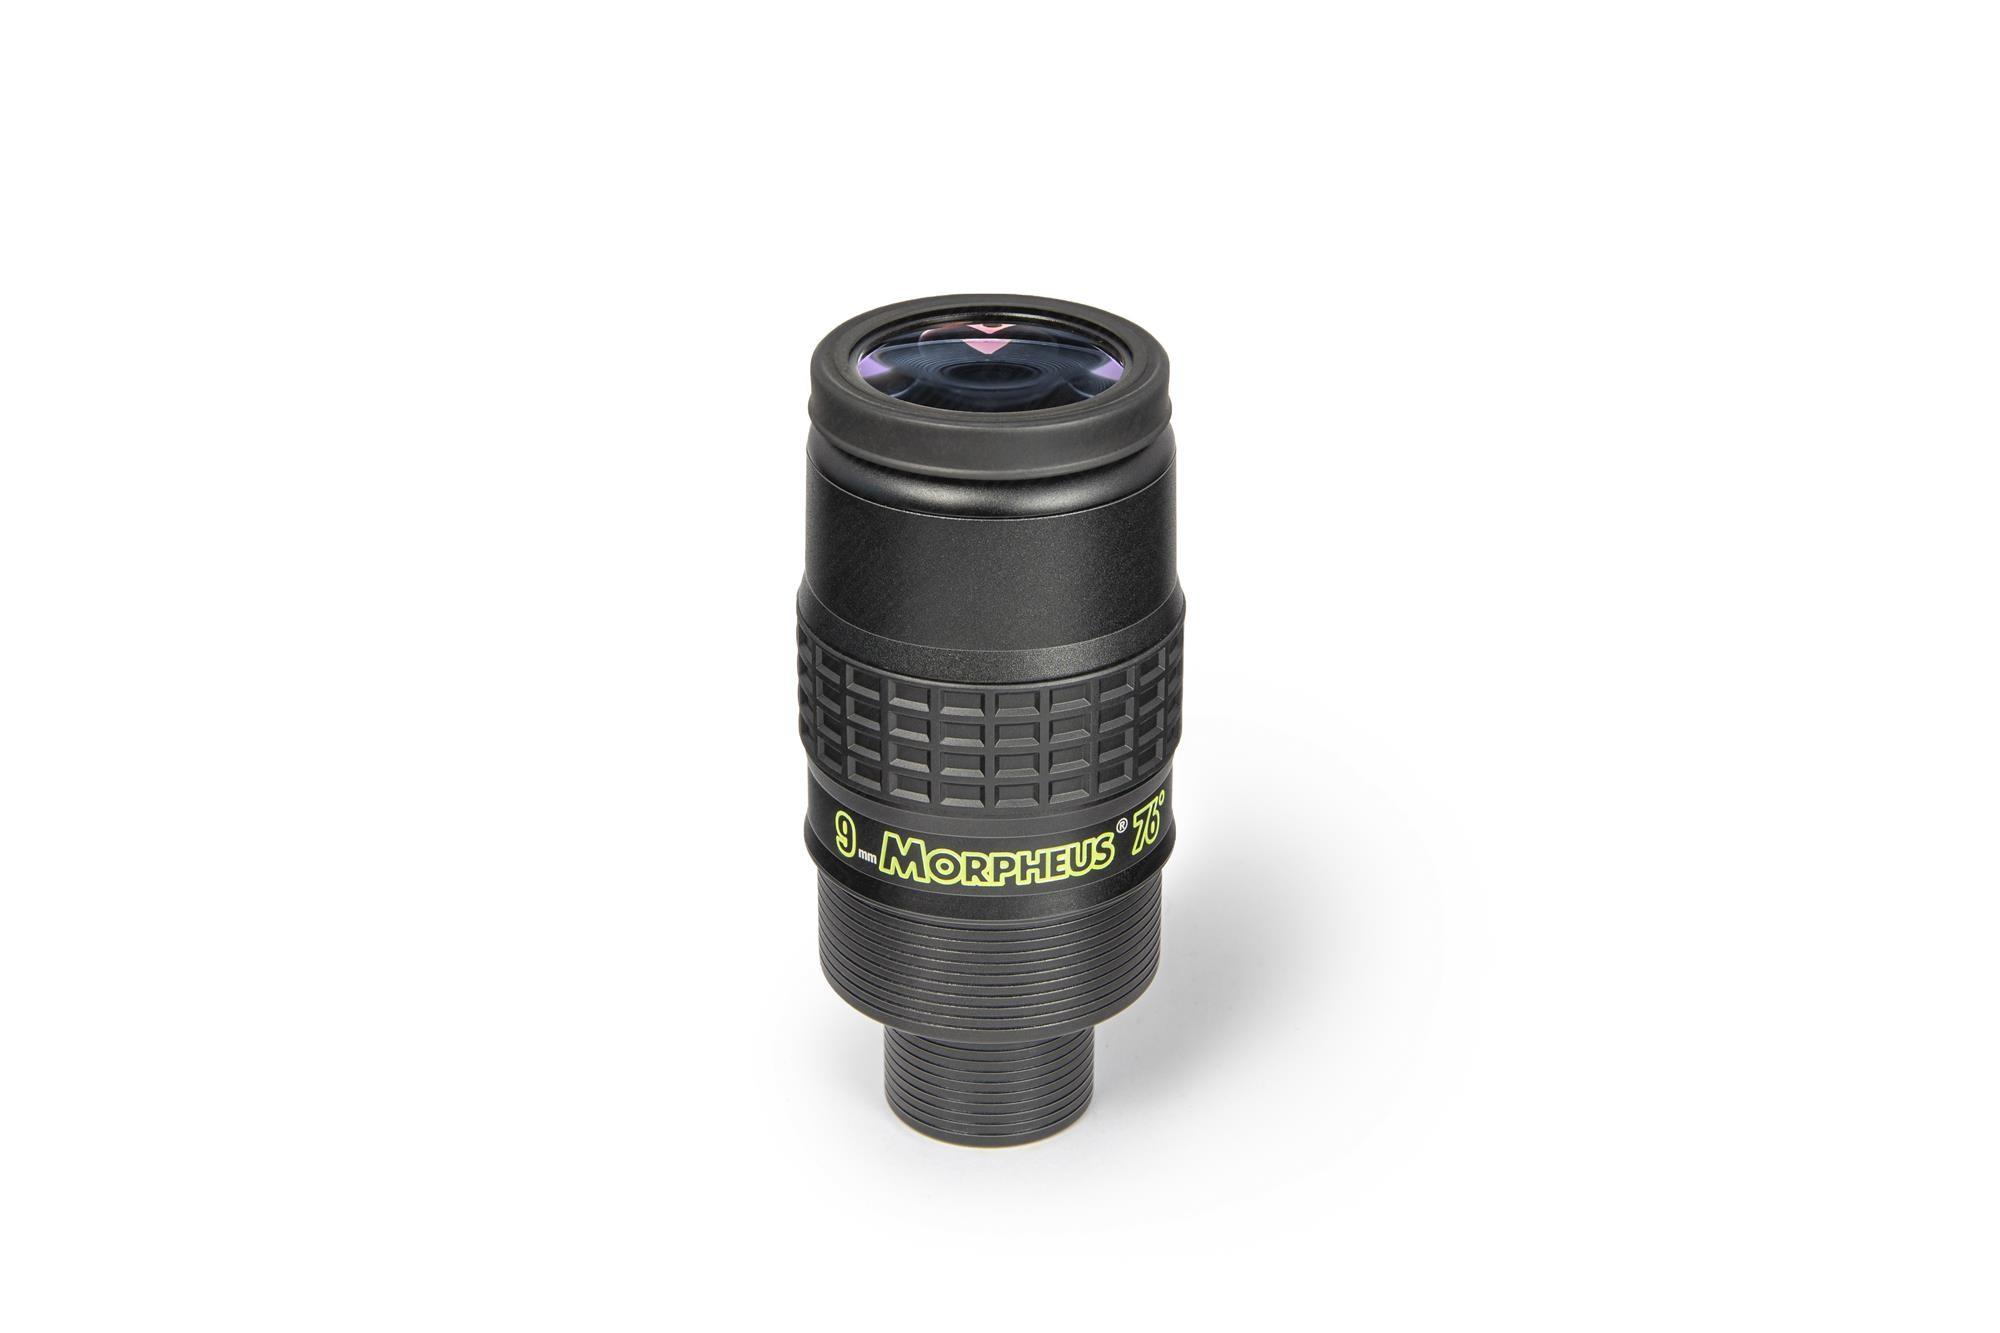 9 mm Morpheus® 76° widefield eyepiece